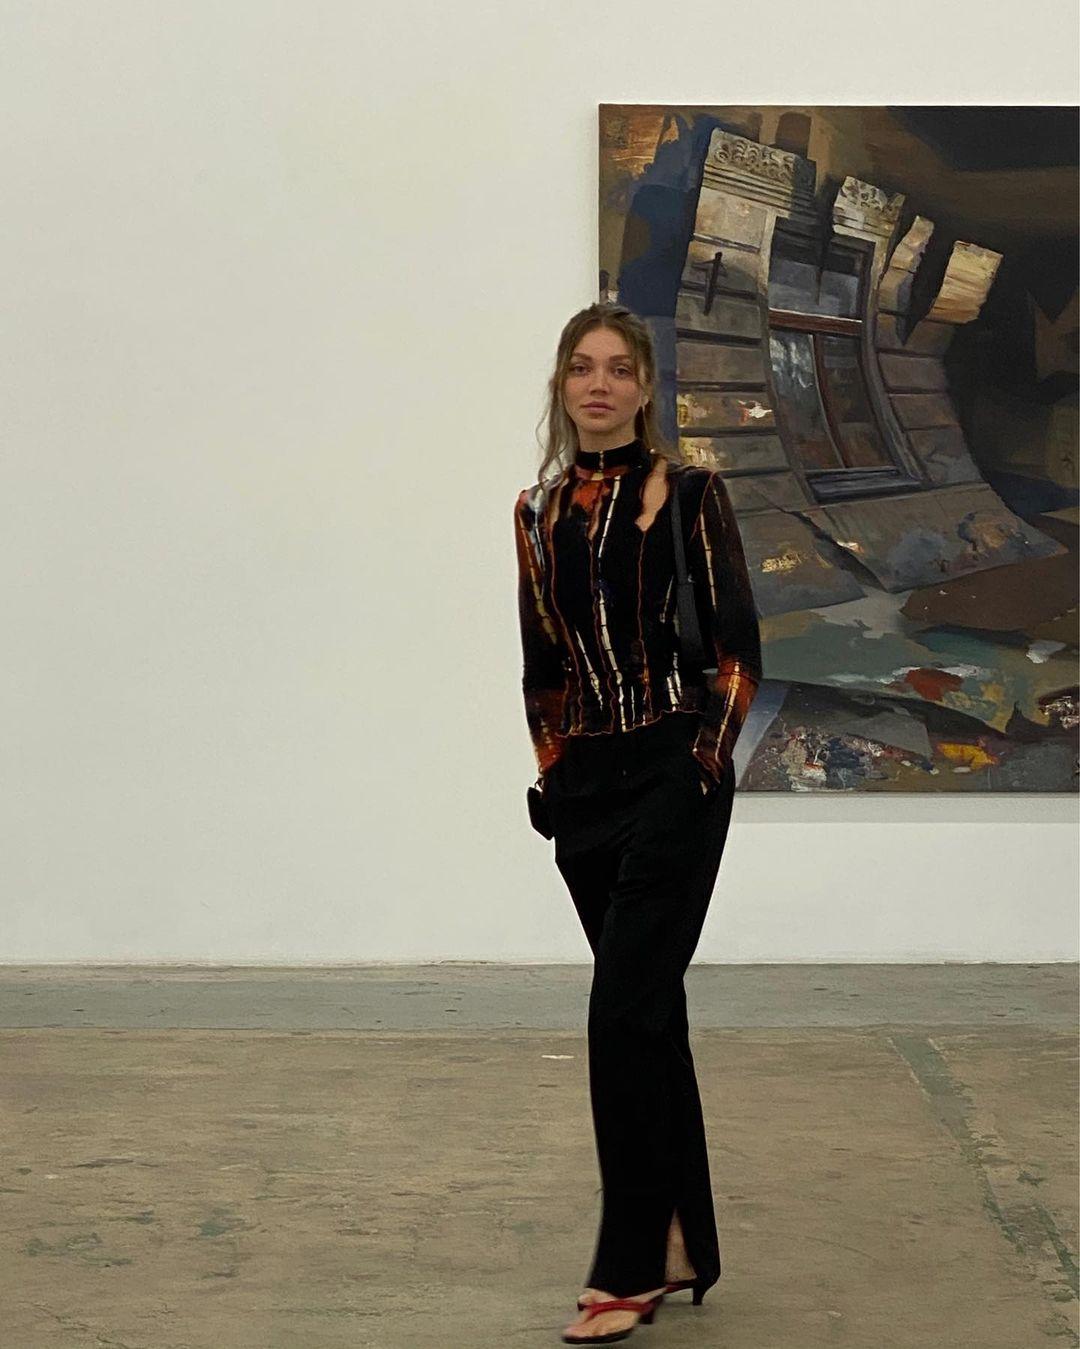 Jessie-Andrews-Wallpapers-Insta-Fit-Bio-2